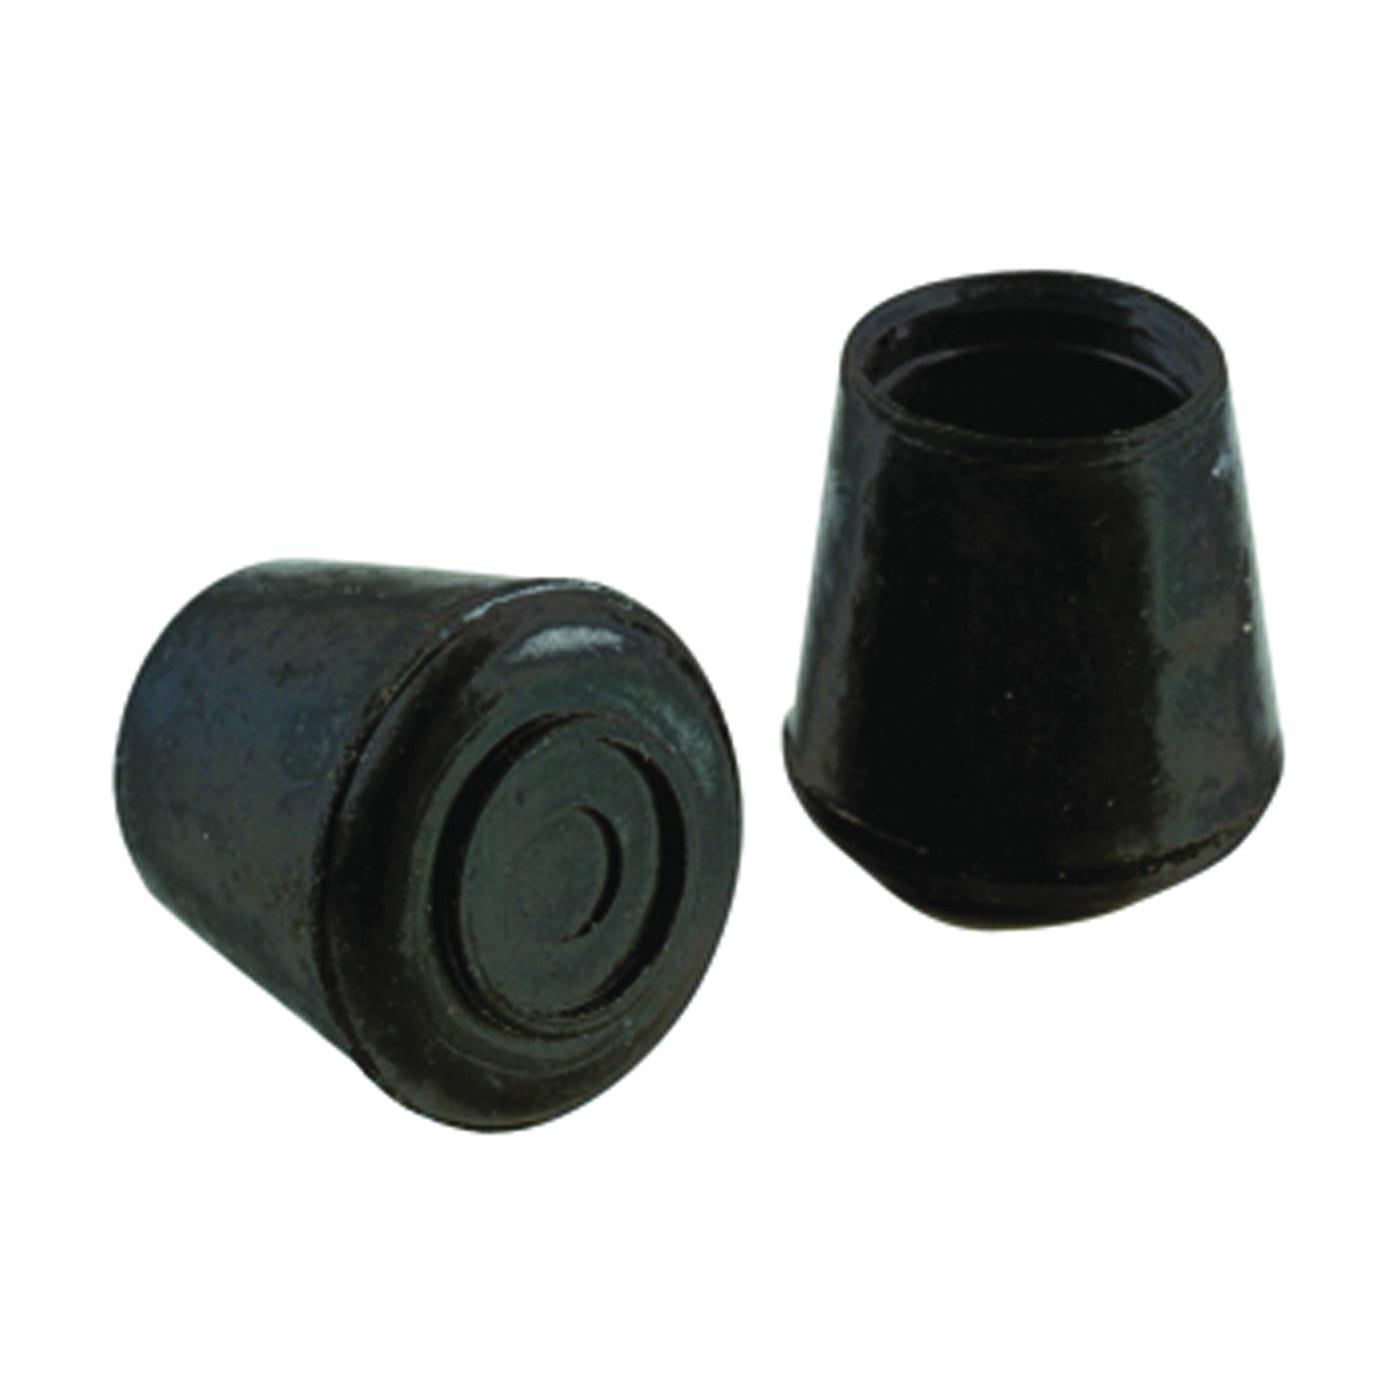 Picture of Shepherd Hardware 9126 Furniture Leg Tip, Round, Rubber, Black, 3/4 in Dia